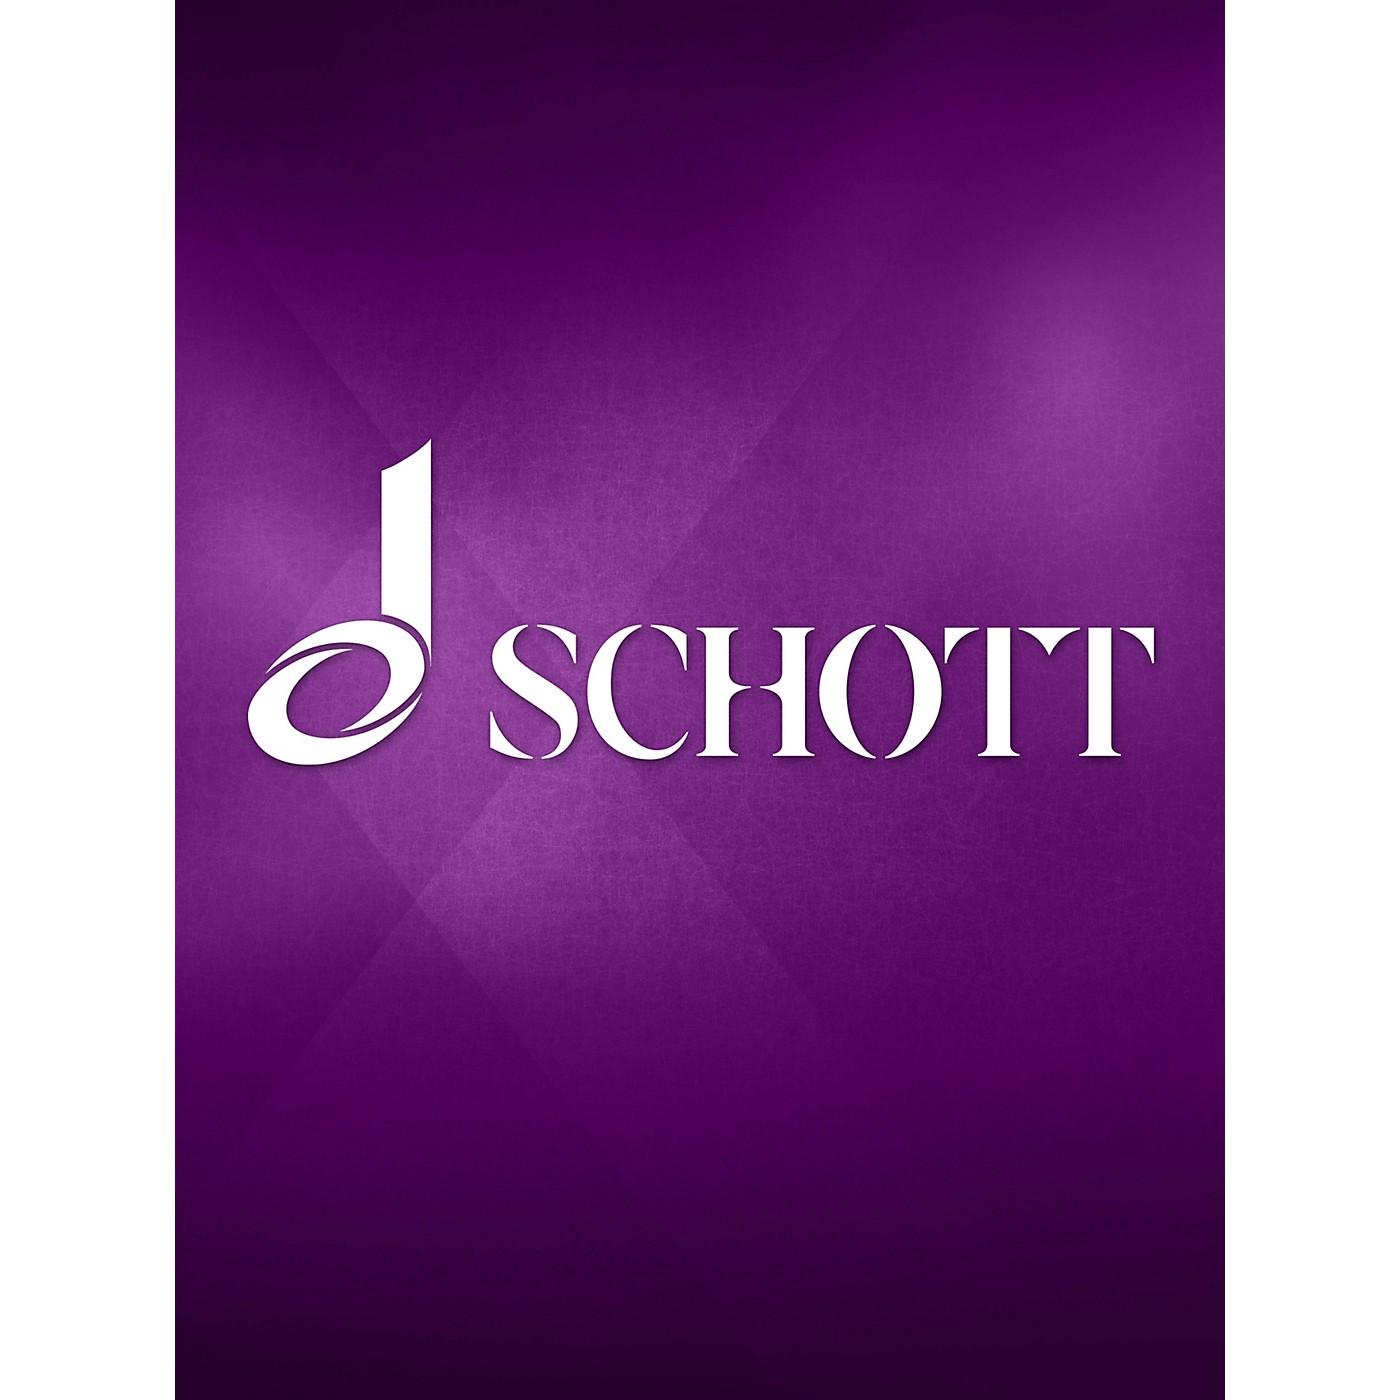 Eulenburg Concerto in F Major, Op. 44, No. 16 RV 98/PV 261 La tempesta di mare Schott Series by Antonio Vivaldi thumbnail